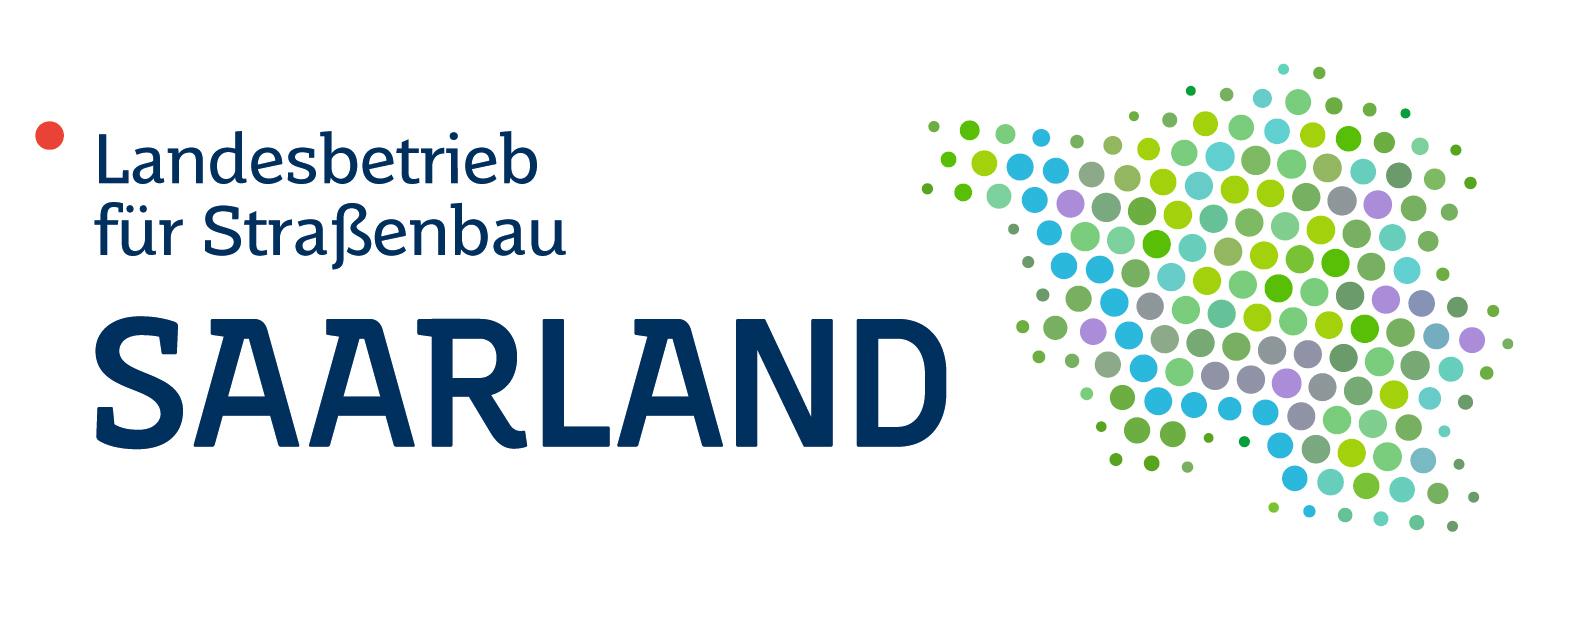 saarland_landesbetrieb-fuer-strassenbau